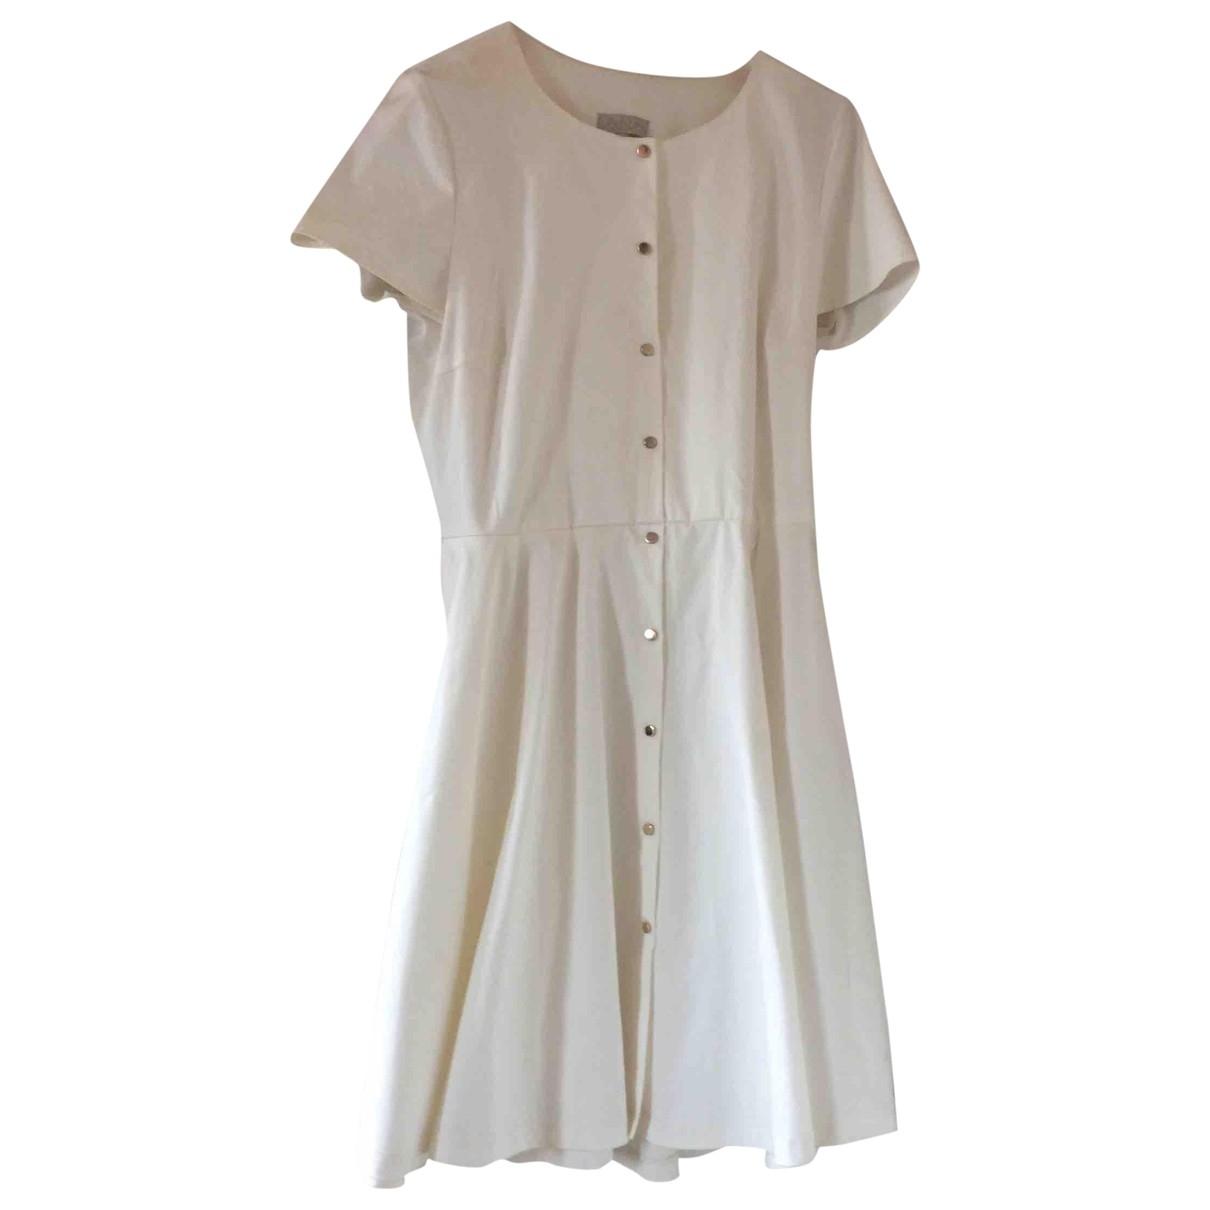 Pablo \N White Cotton dress for Women 40 FR